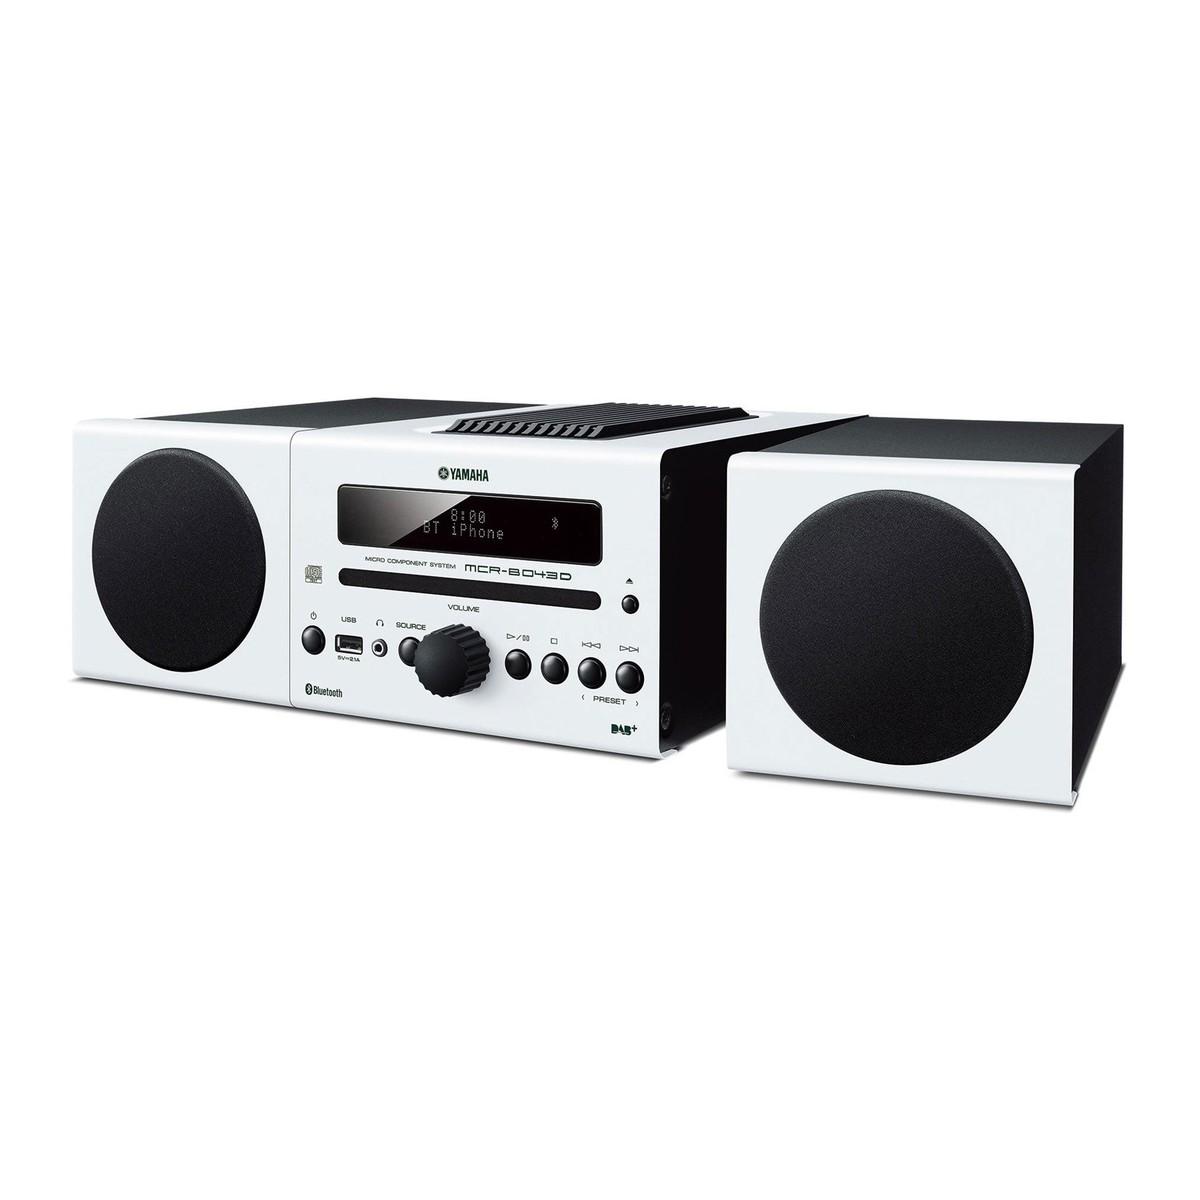 yamaha mcrb043dwhuk mini stereoanlage mit bluetooth. Black Bedroom Furniture Sets. Home Design Ideas